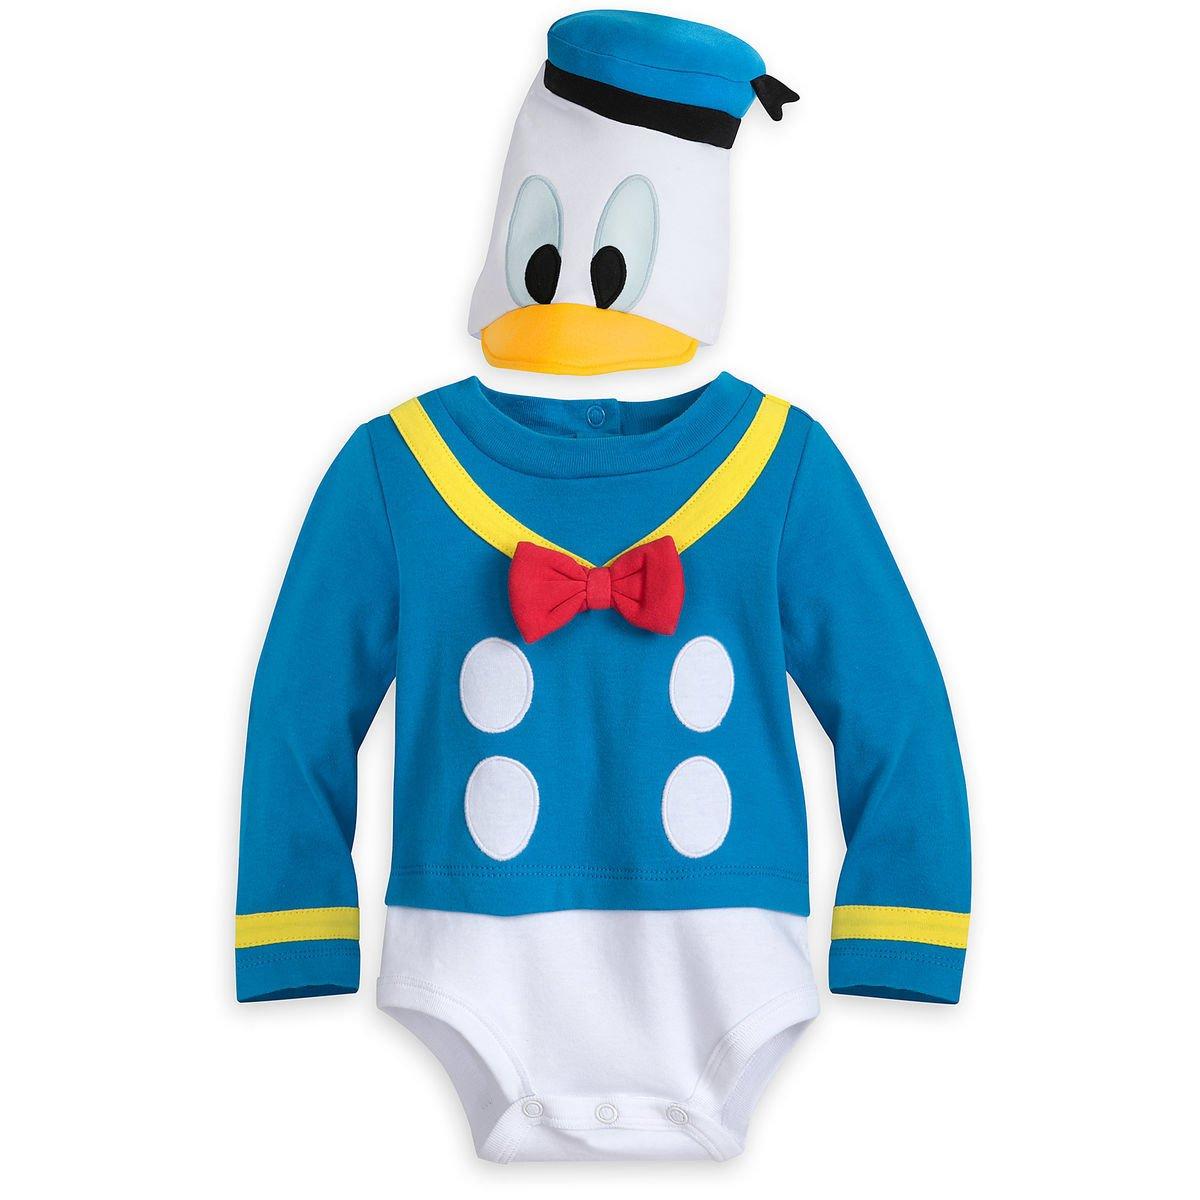 Disney Store Donald Duck Baby Costume Bodysuit Hat 3-6 Months 2018 New